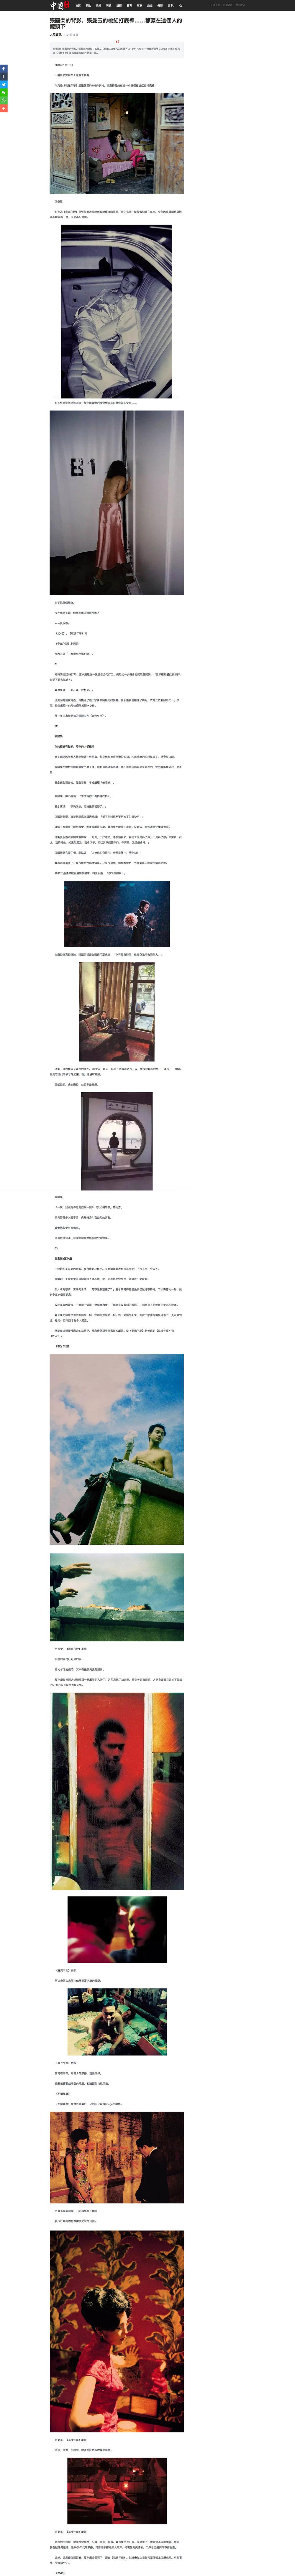 Xcnnews p1.jpg